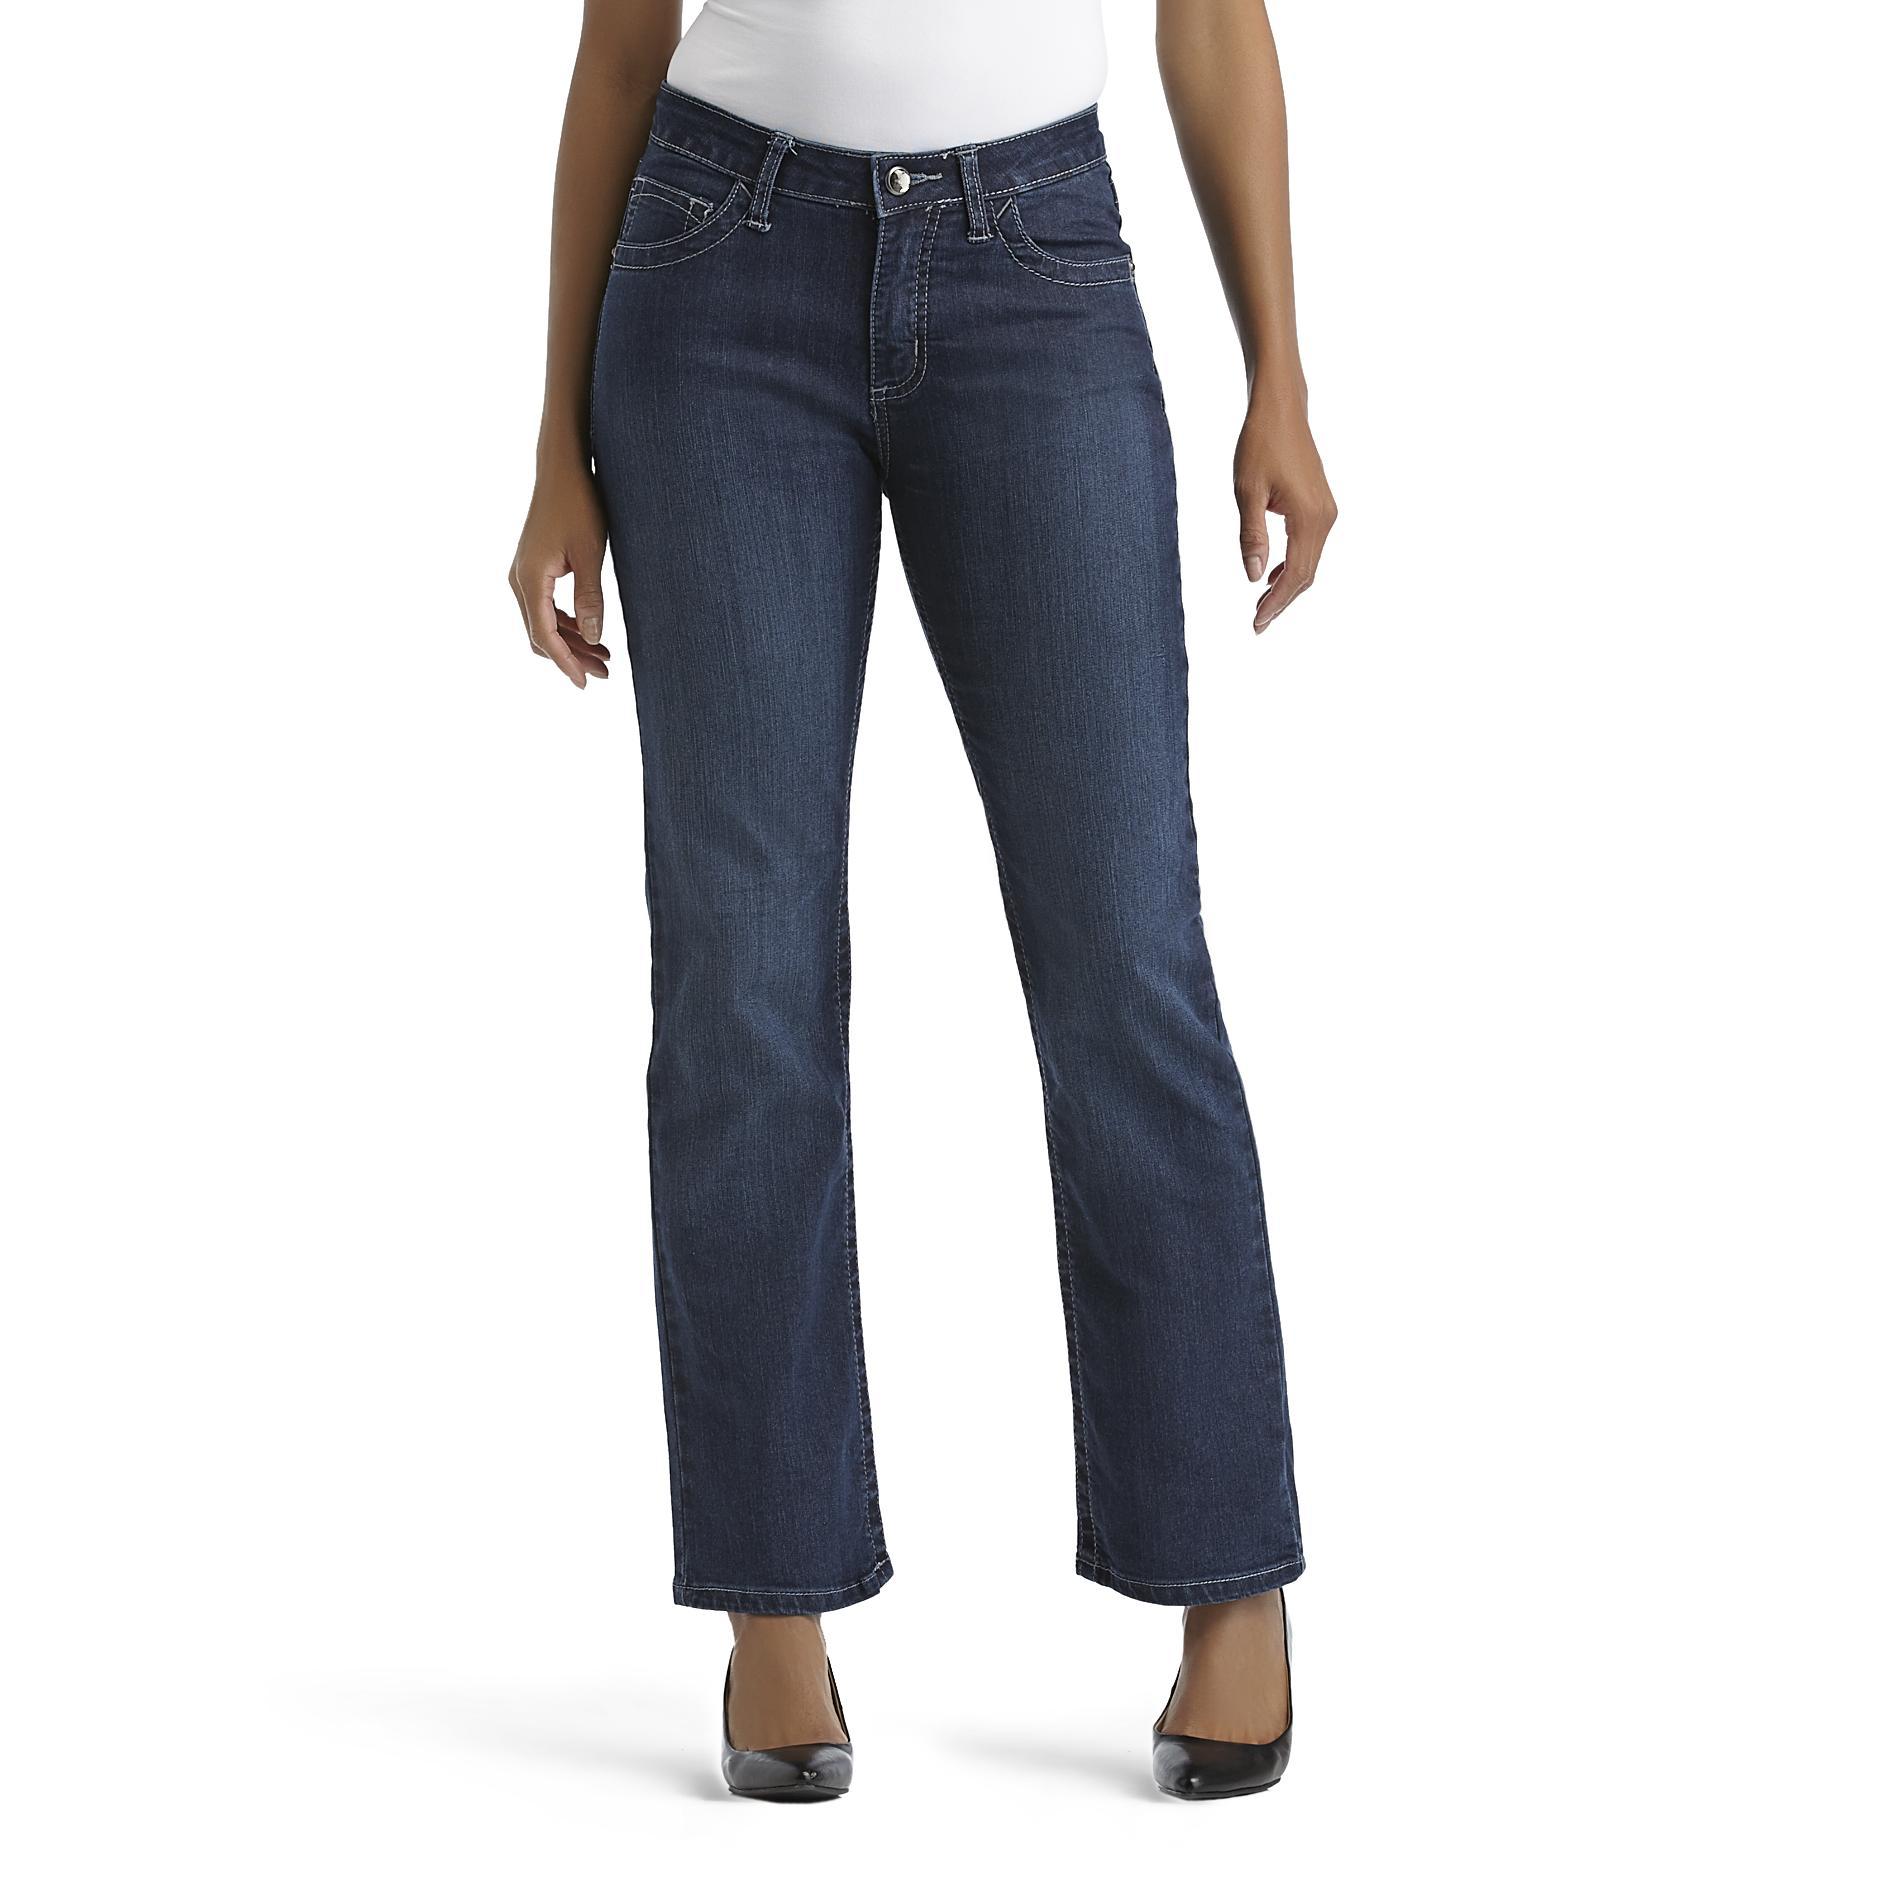 Lee Women' Curvy Straight Leg Jeans